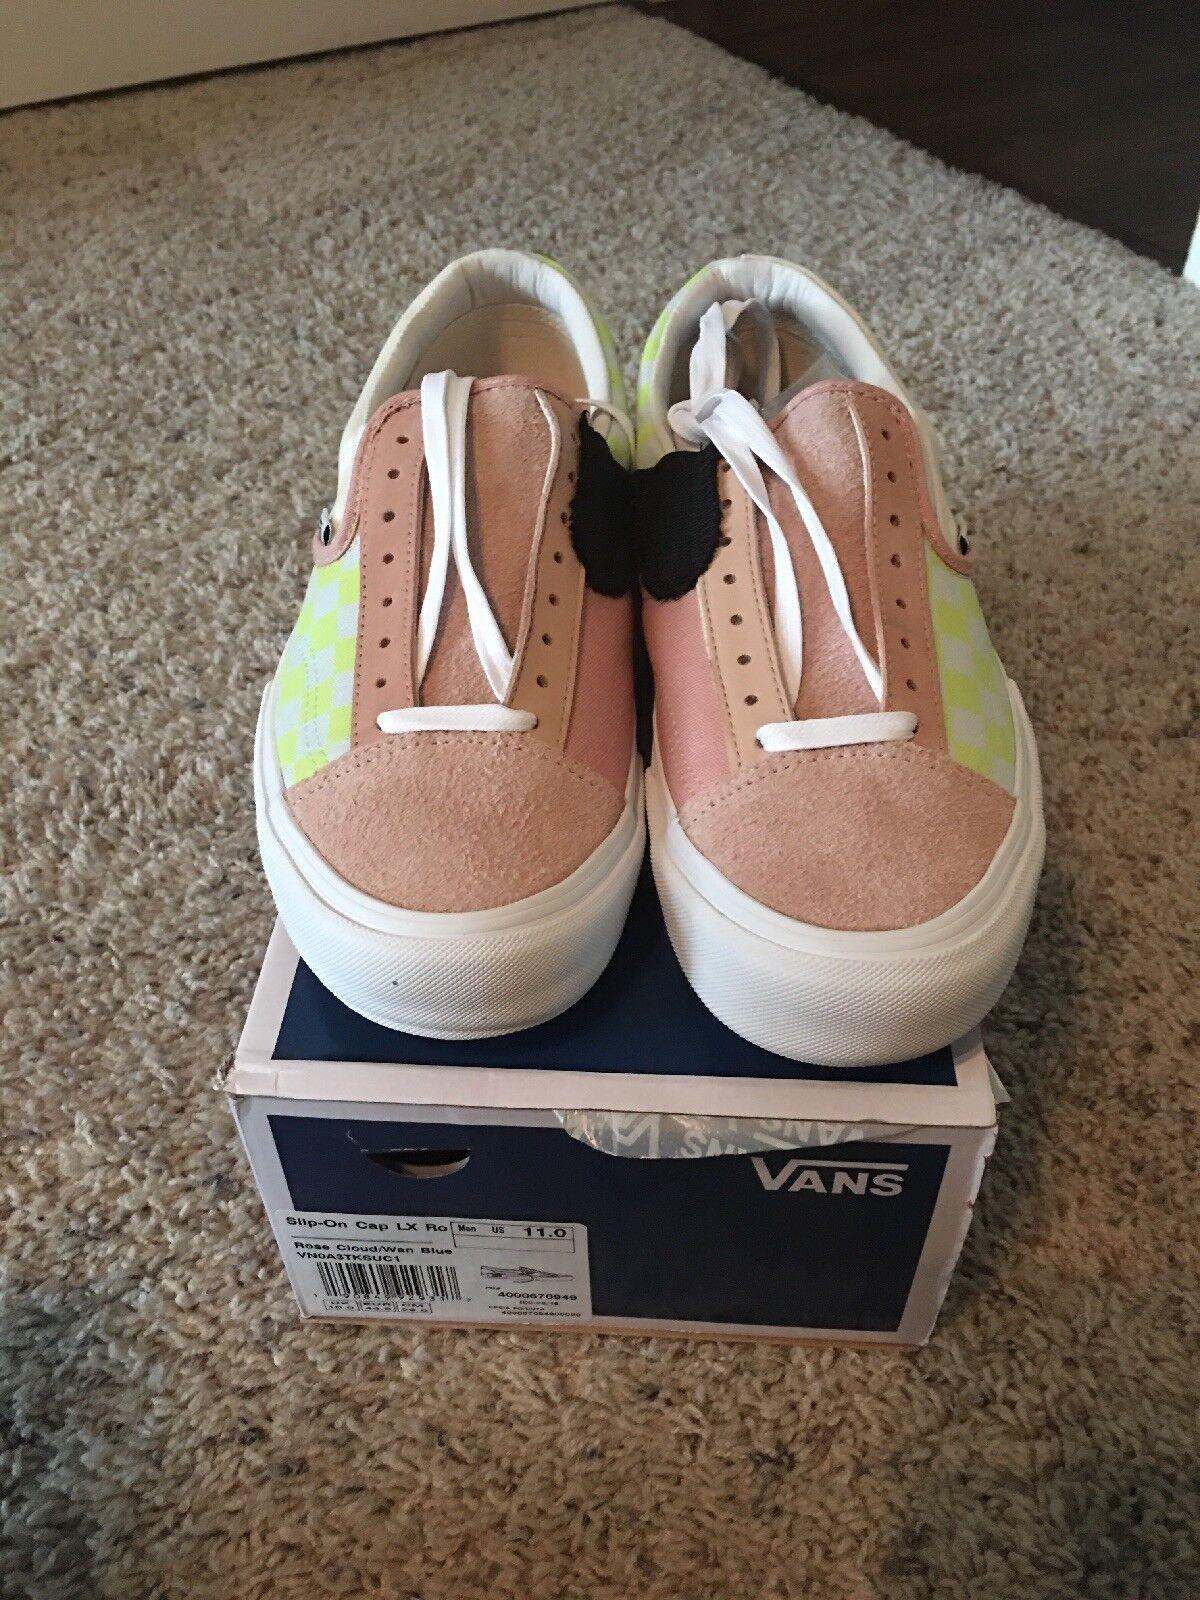 Vans Vault Cut And Paste CAP LX Slip-On Rose Cloud US 11 NEW deconstructed pink